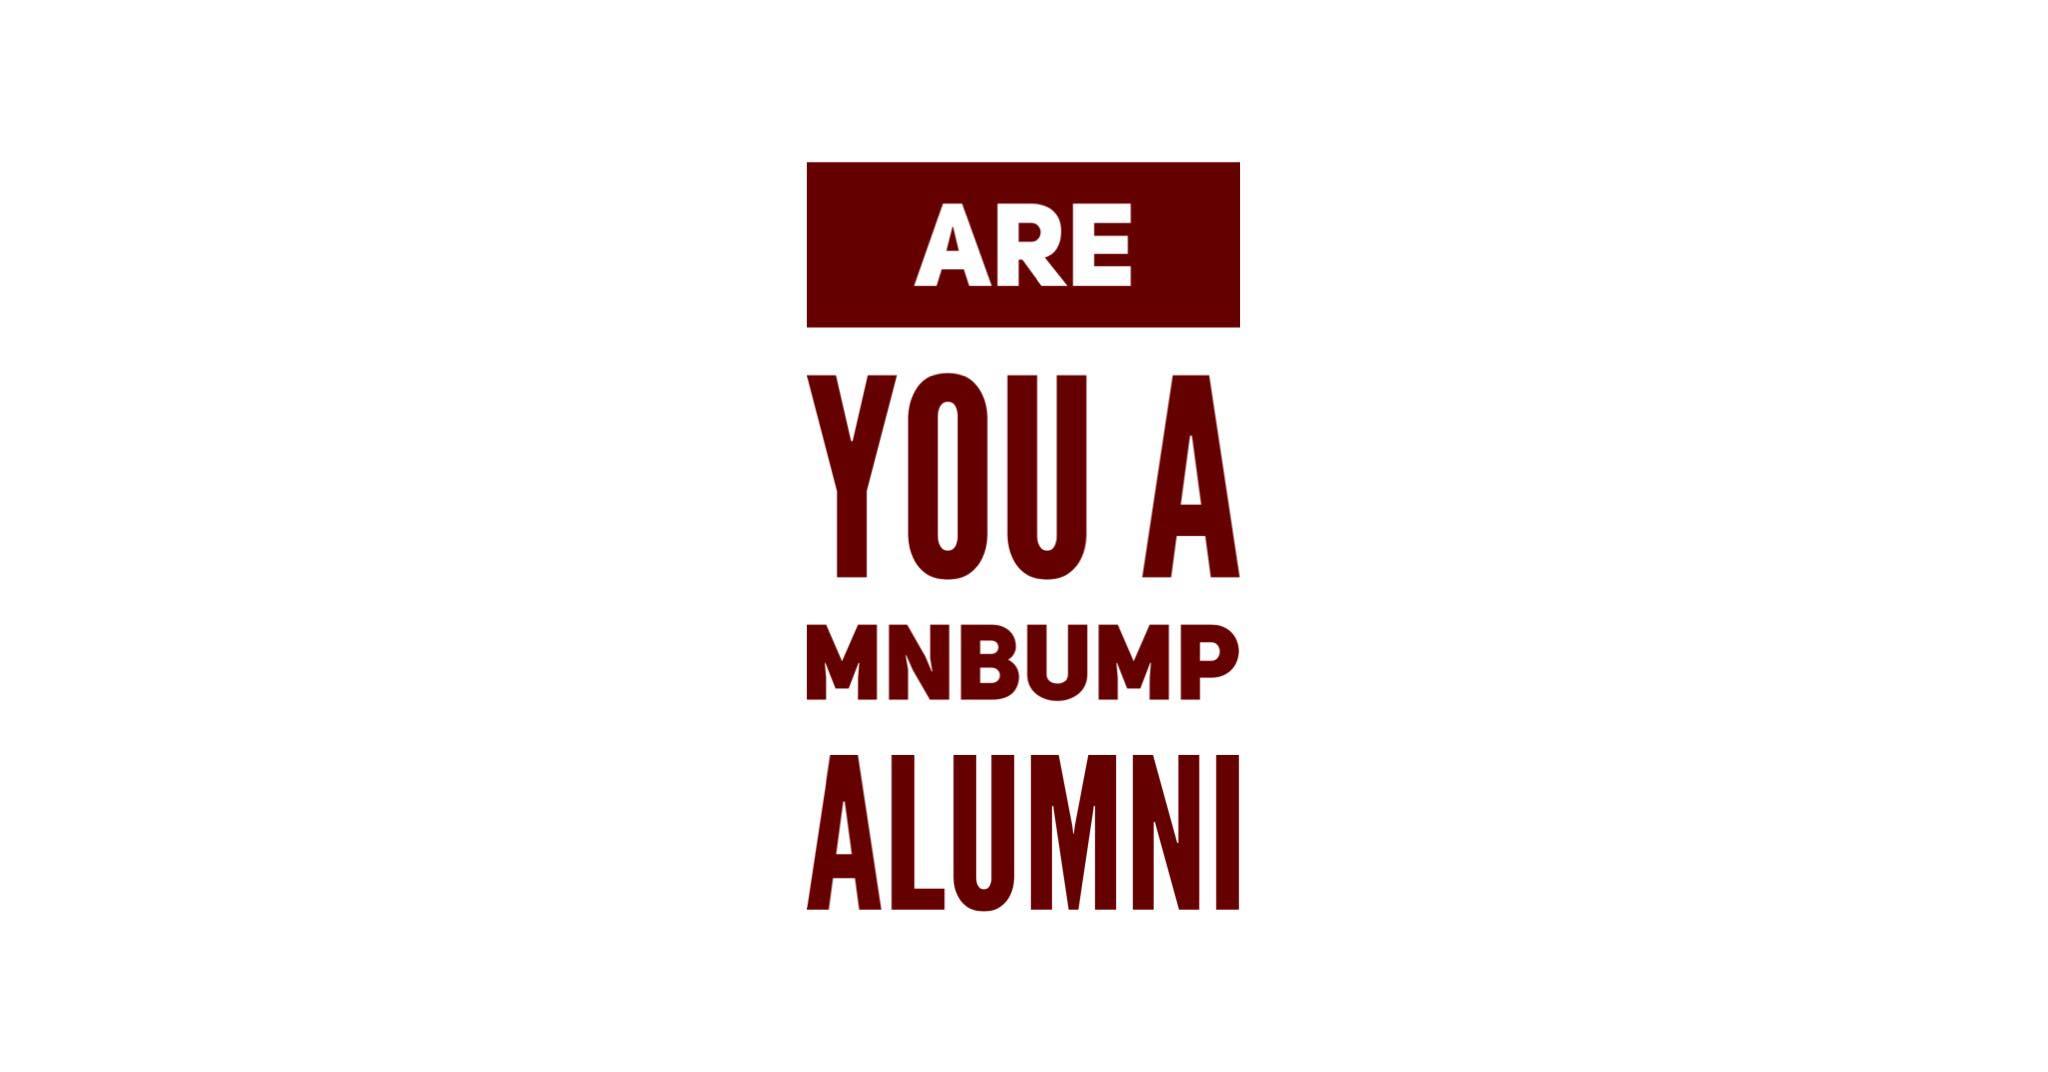 MNbump Alumni